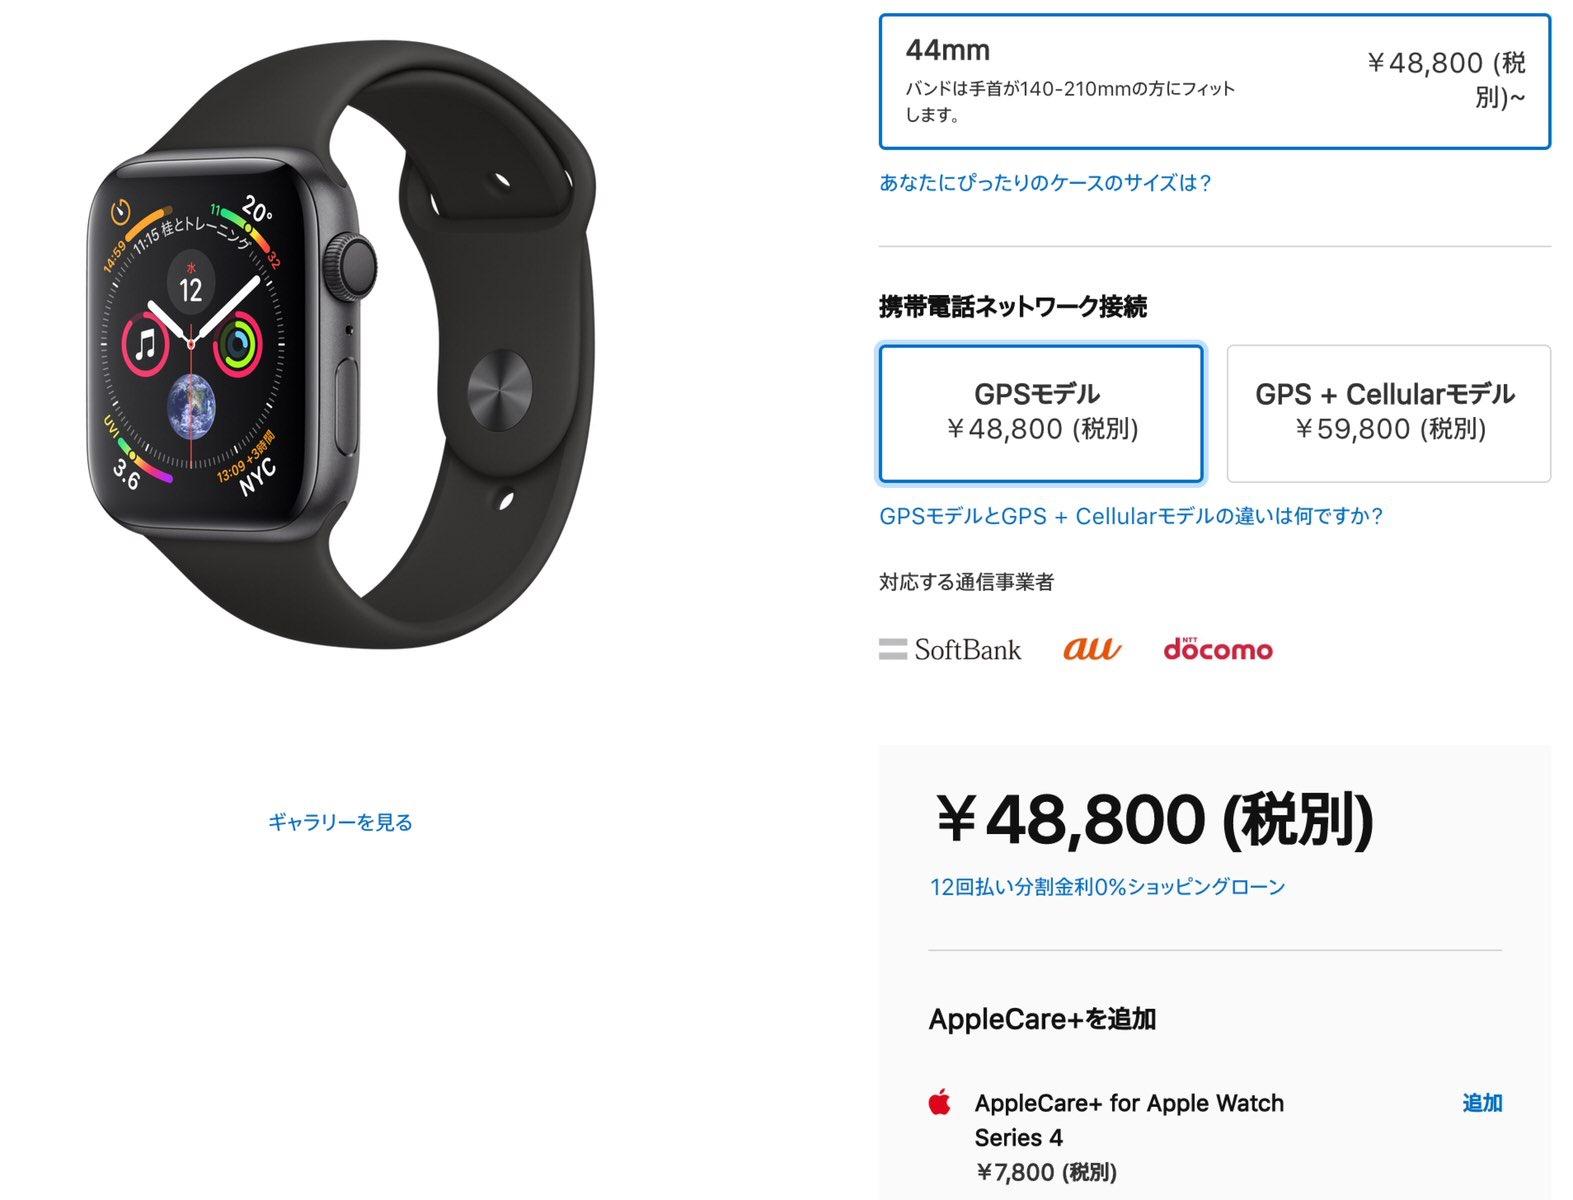 Apple Watch Series 4-4